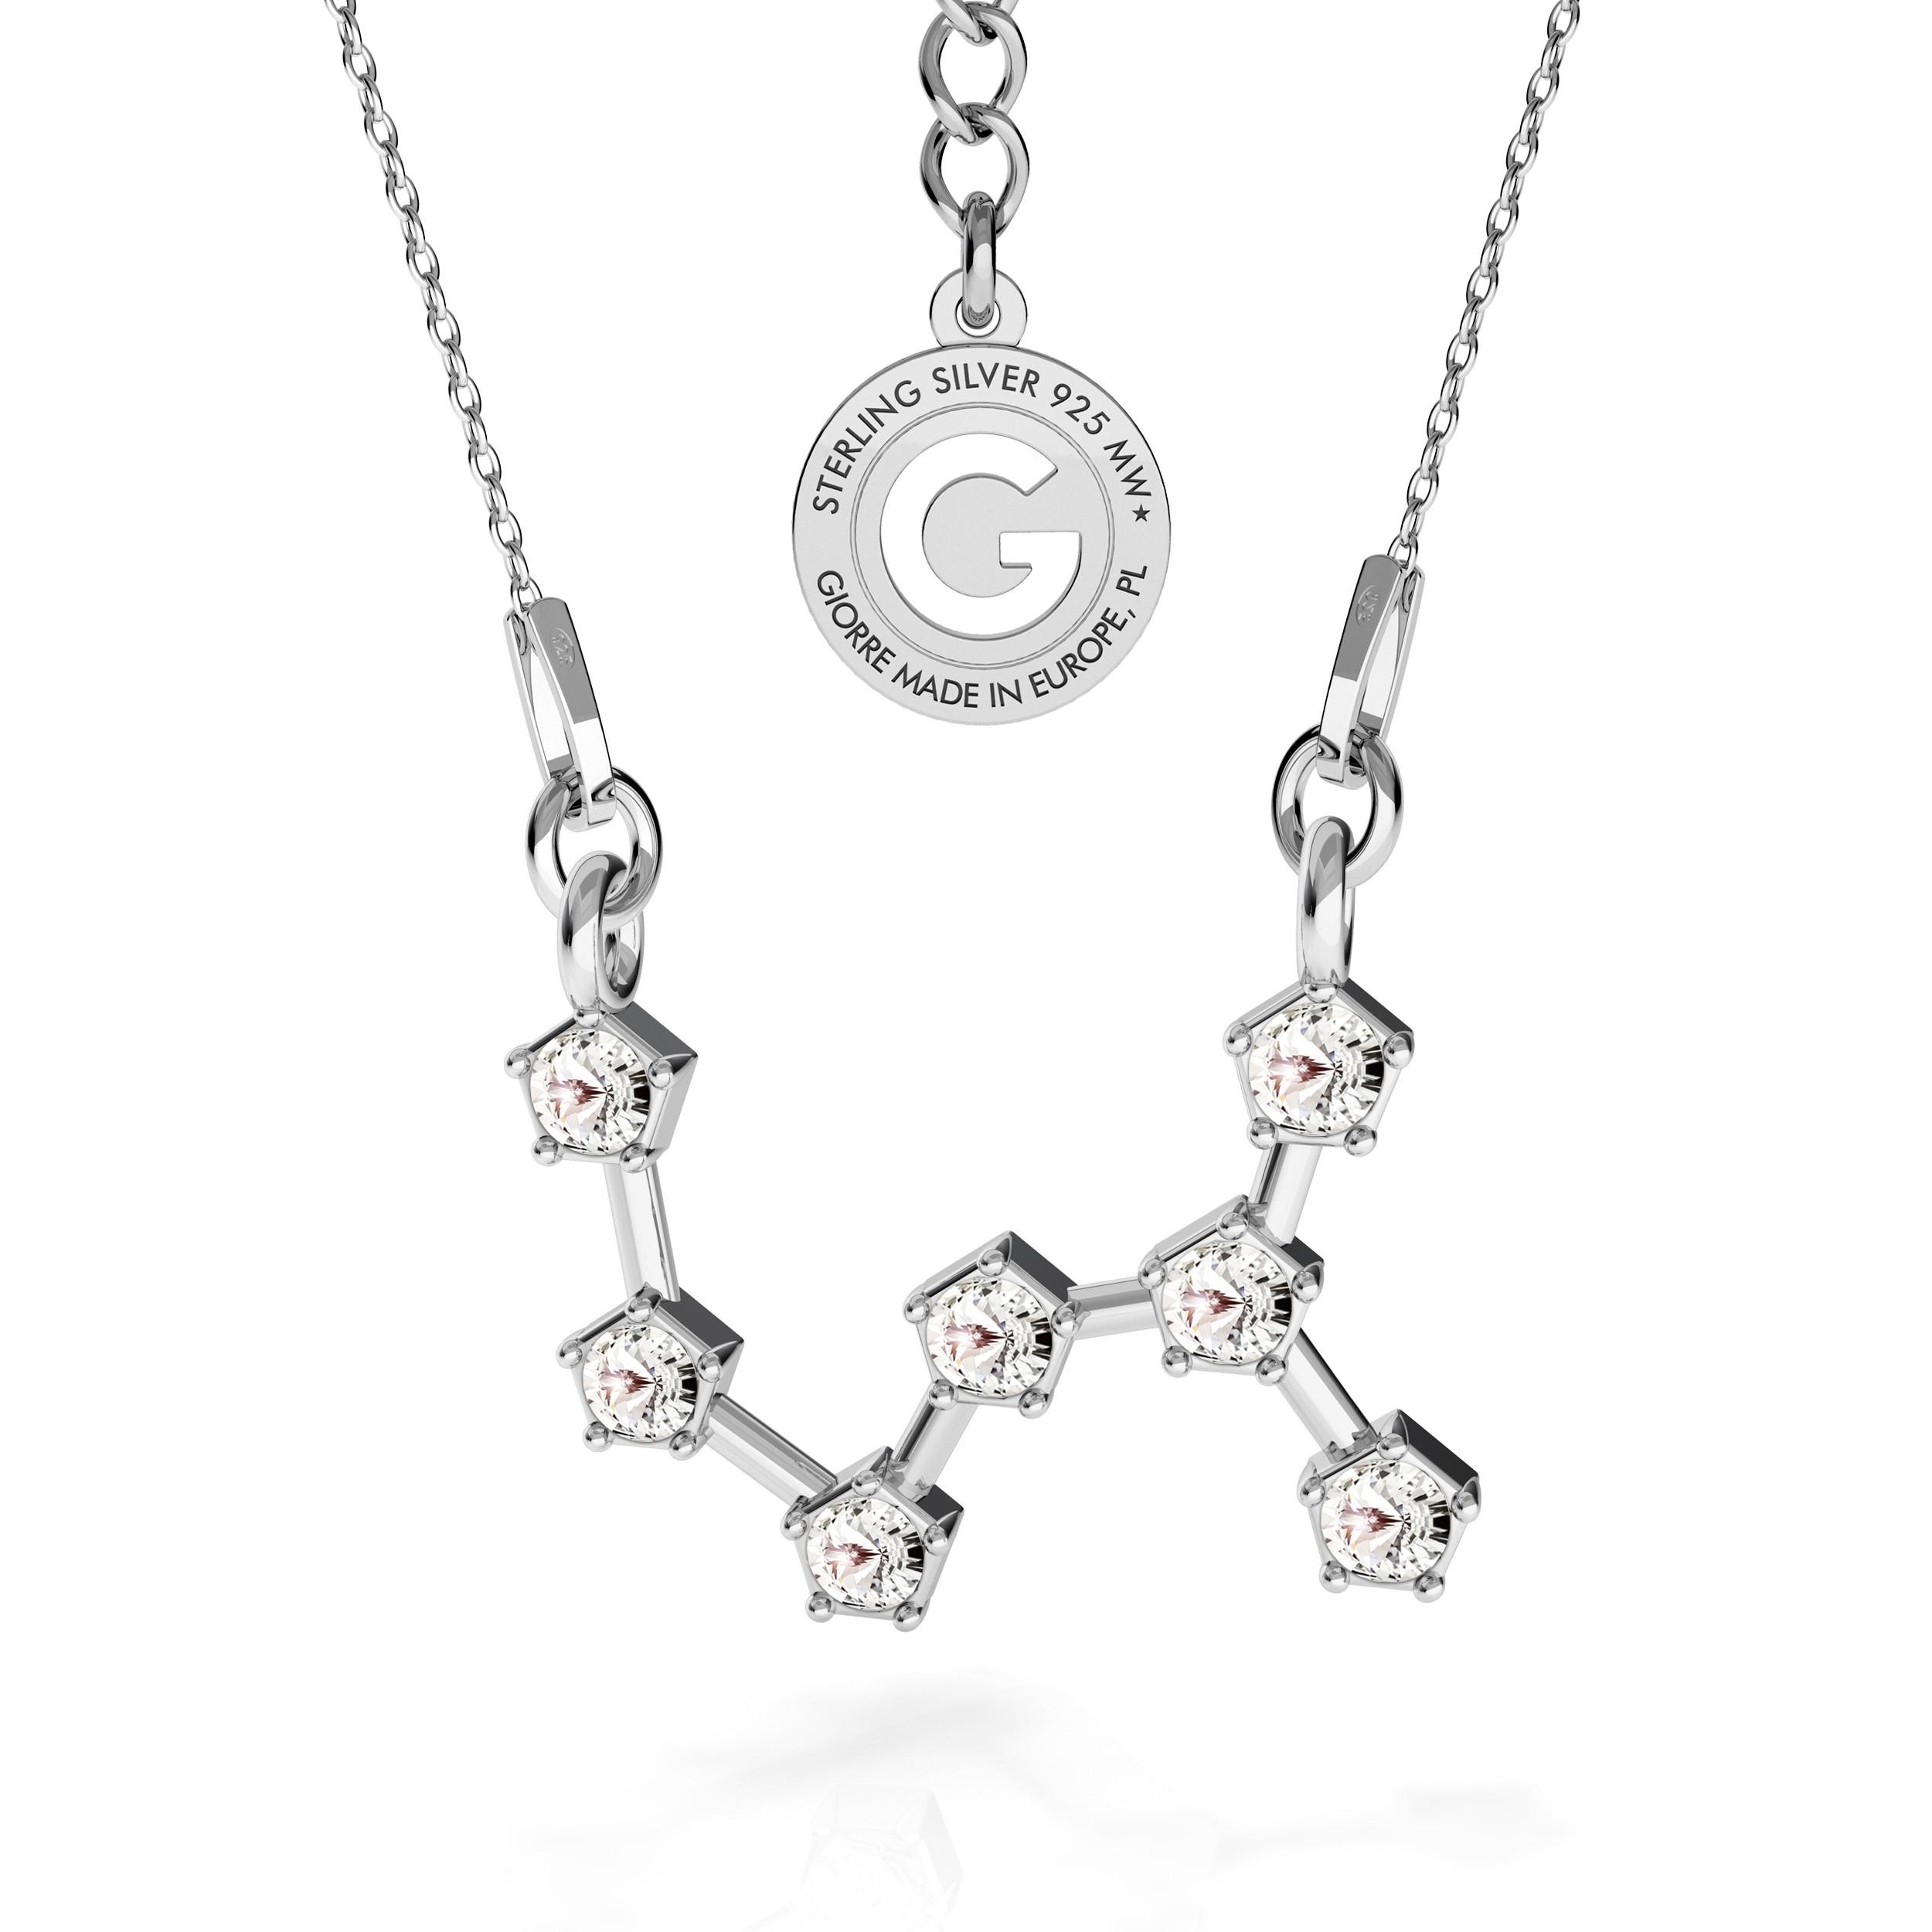 SCORPION zodiac sign necklace with Swarovski Crystals silver 925